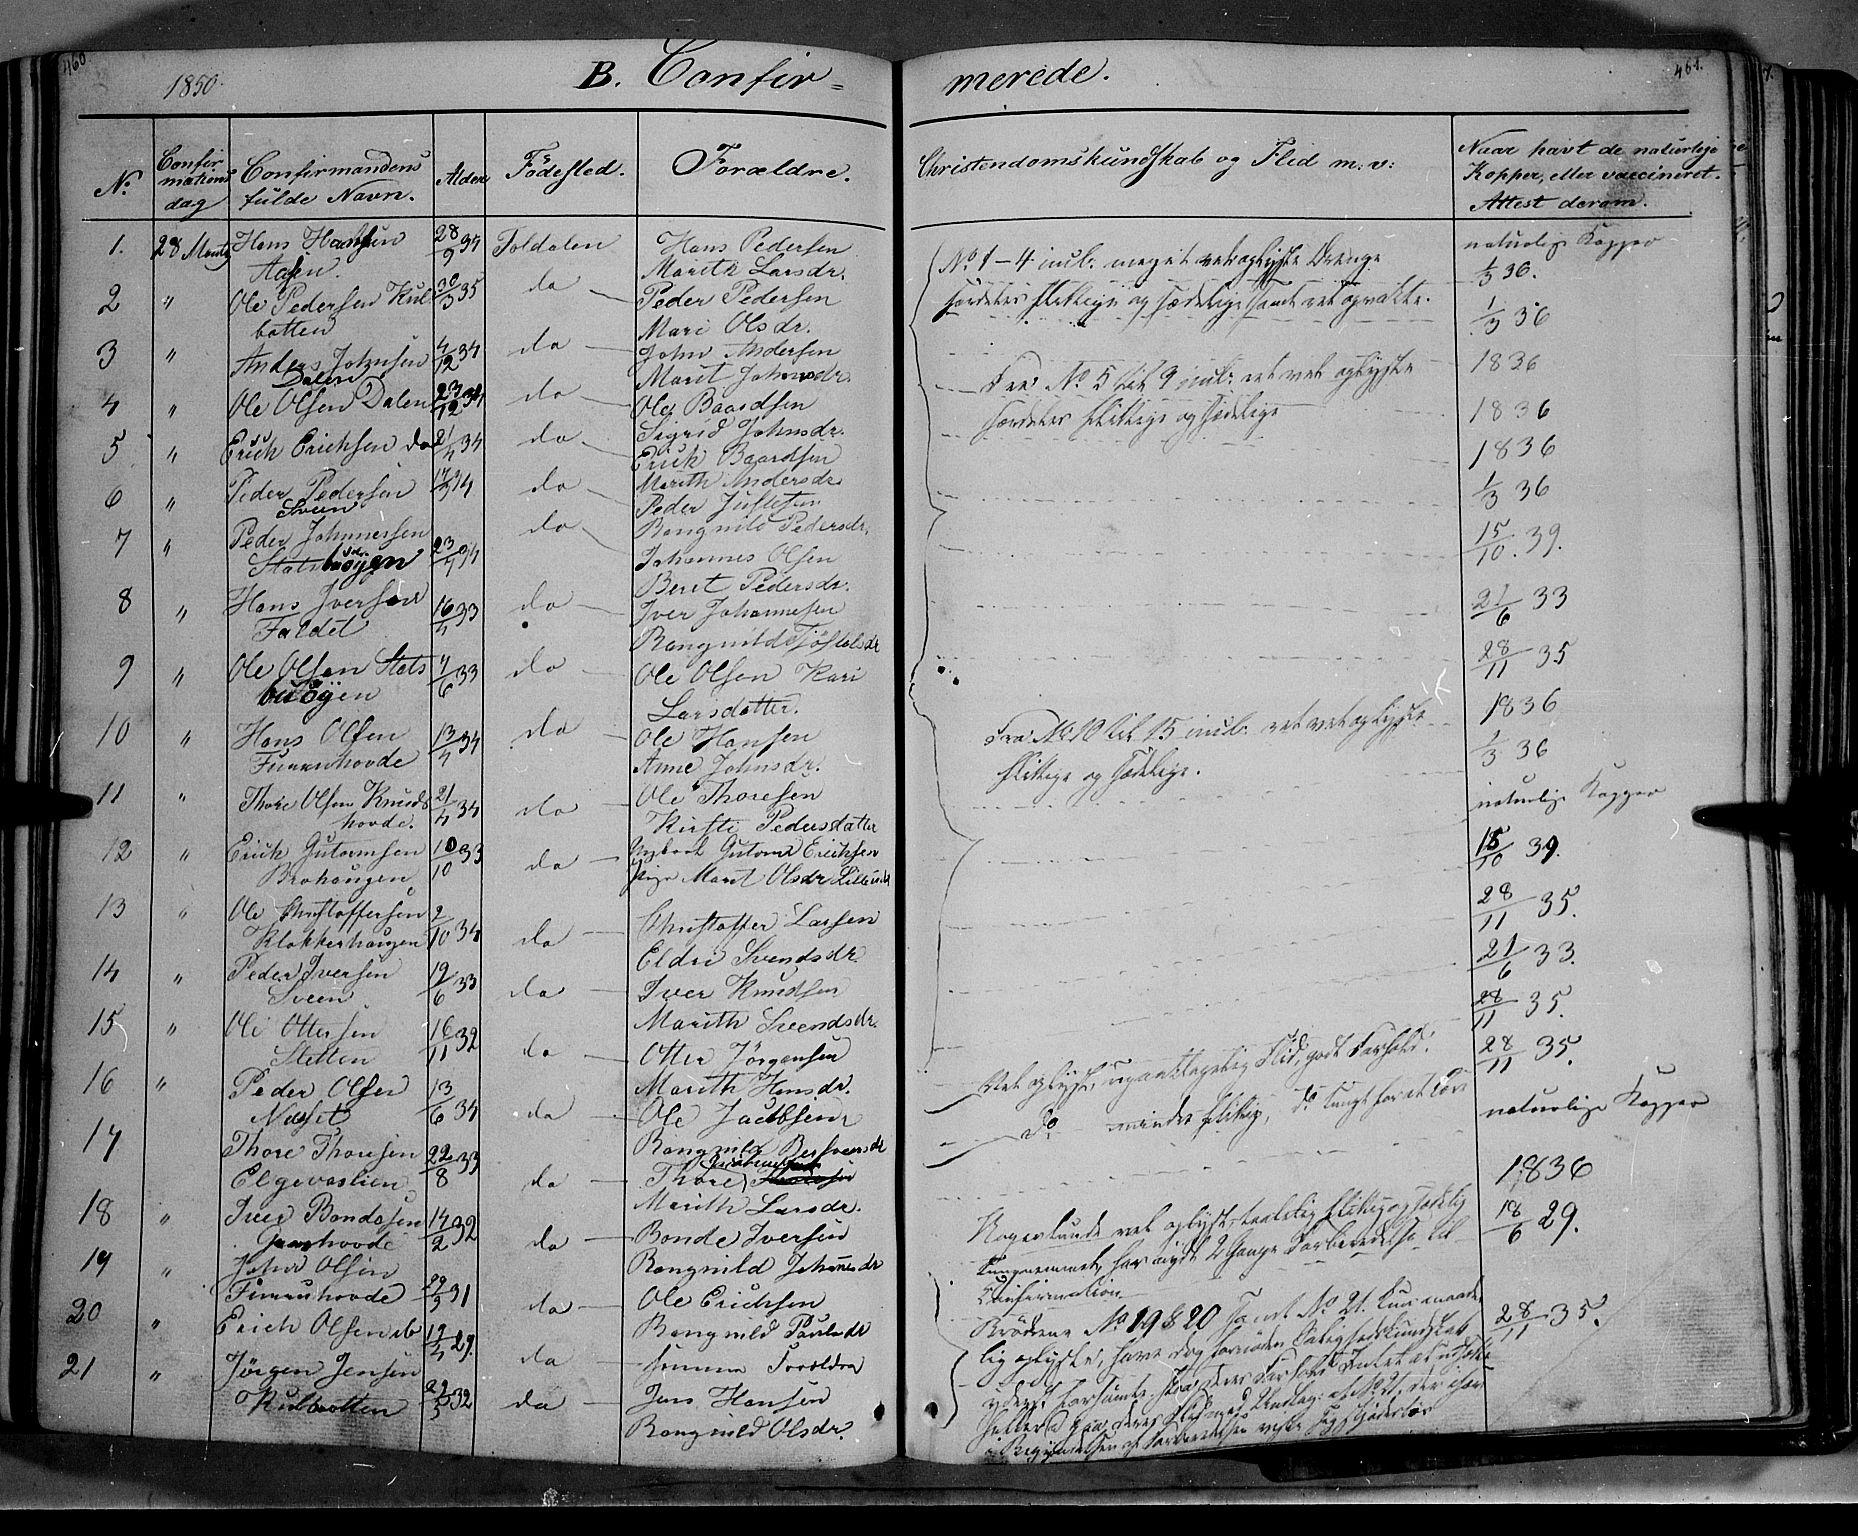 SAH, Lesja prestekontor, Ministerialbok nr. 6A, 1843-1854, s. 460-461